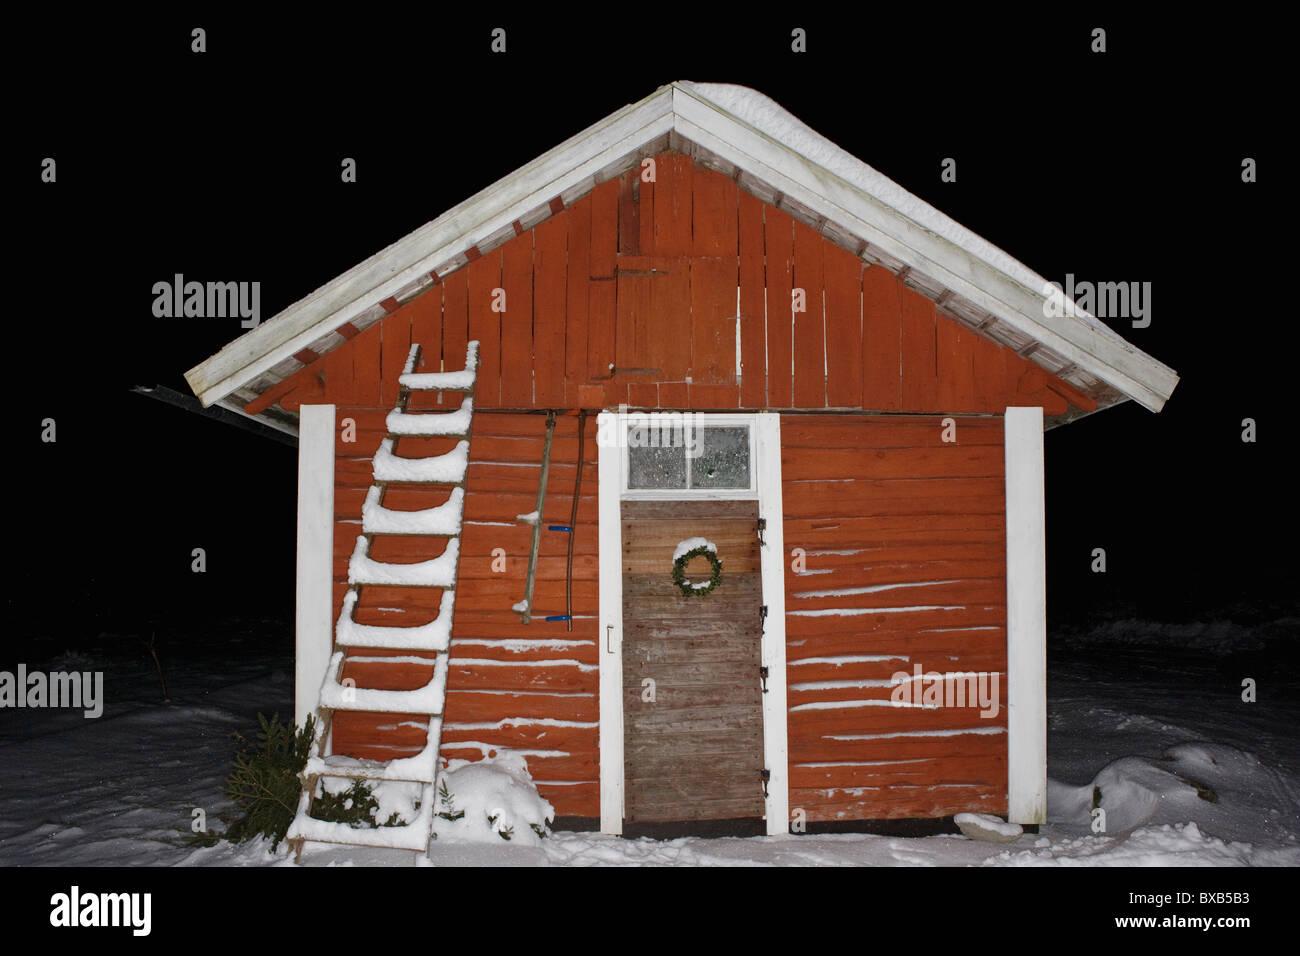 Hut in winter - Stock Image